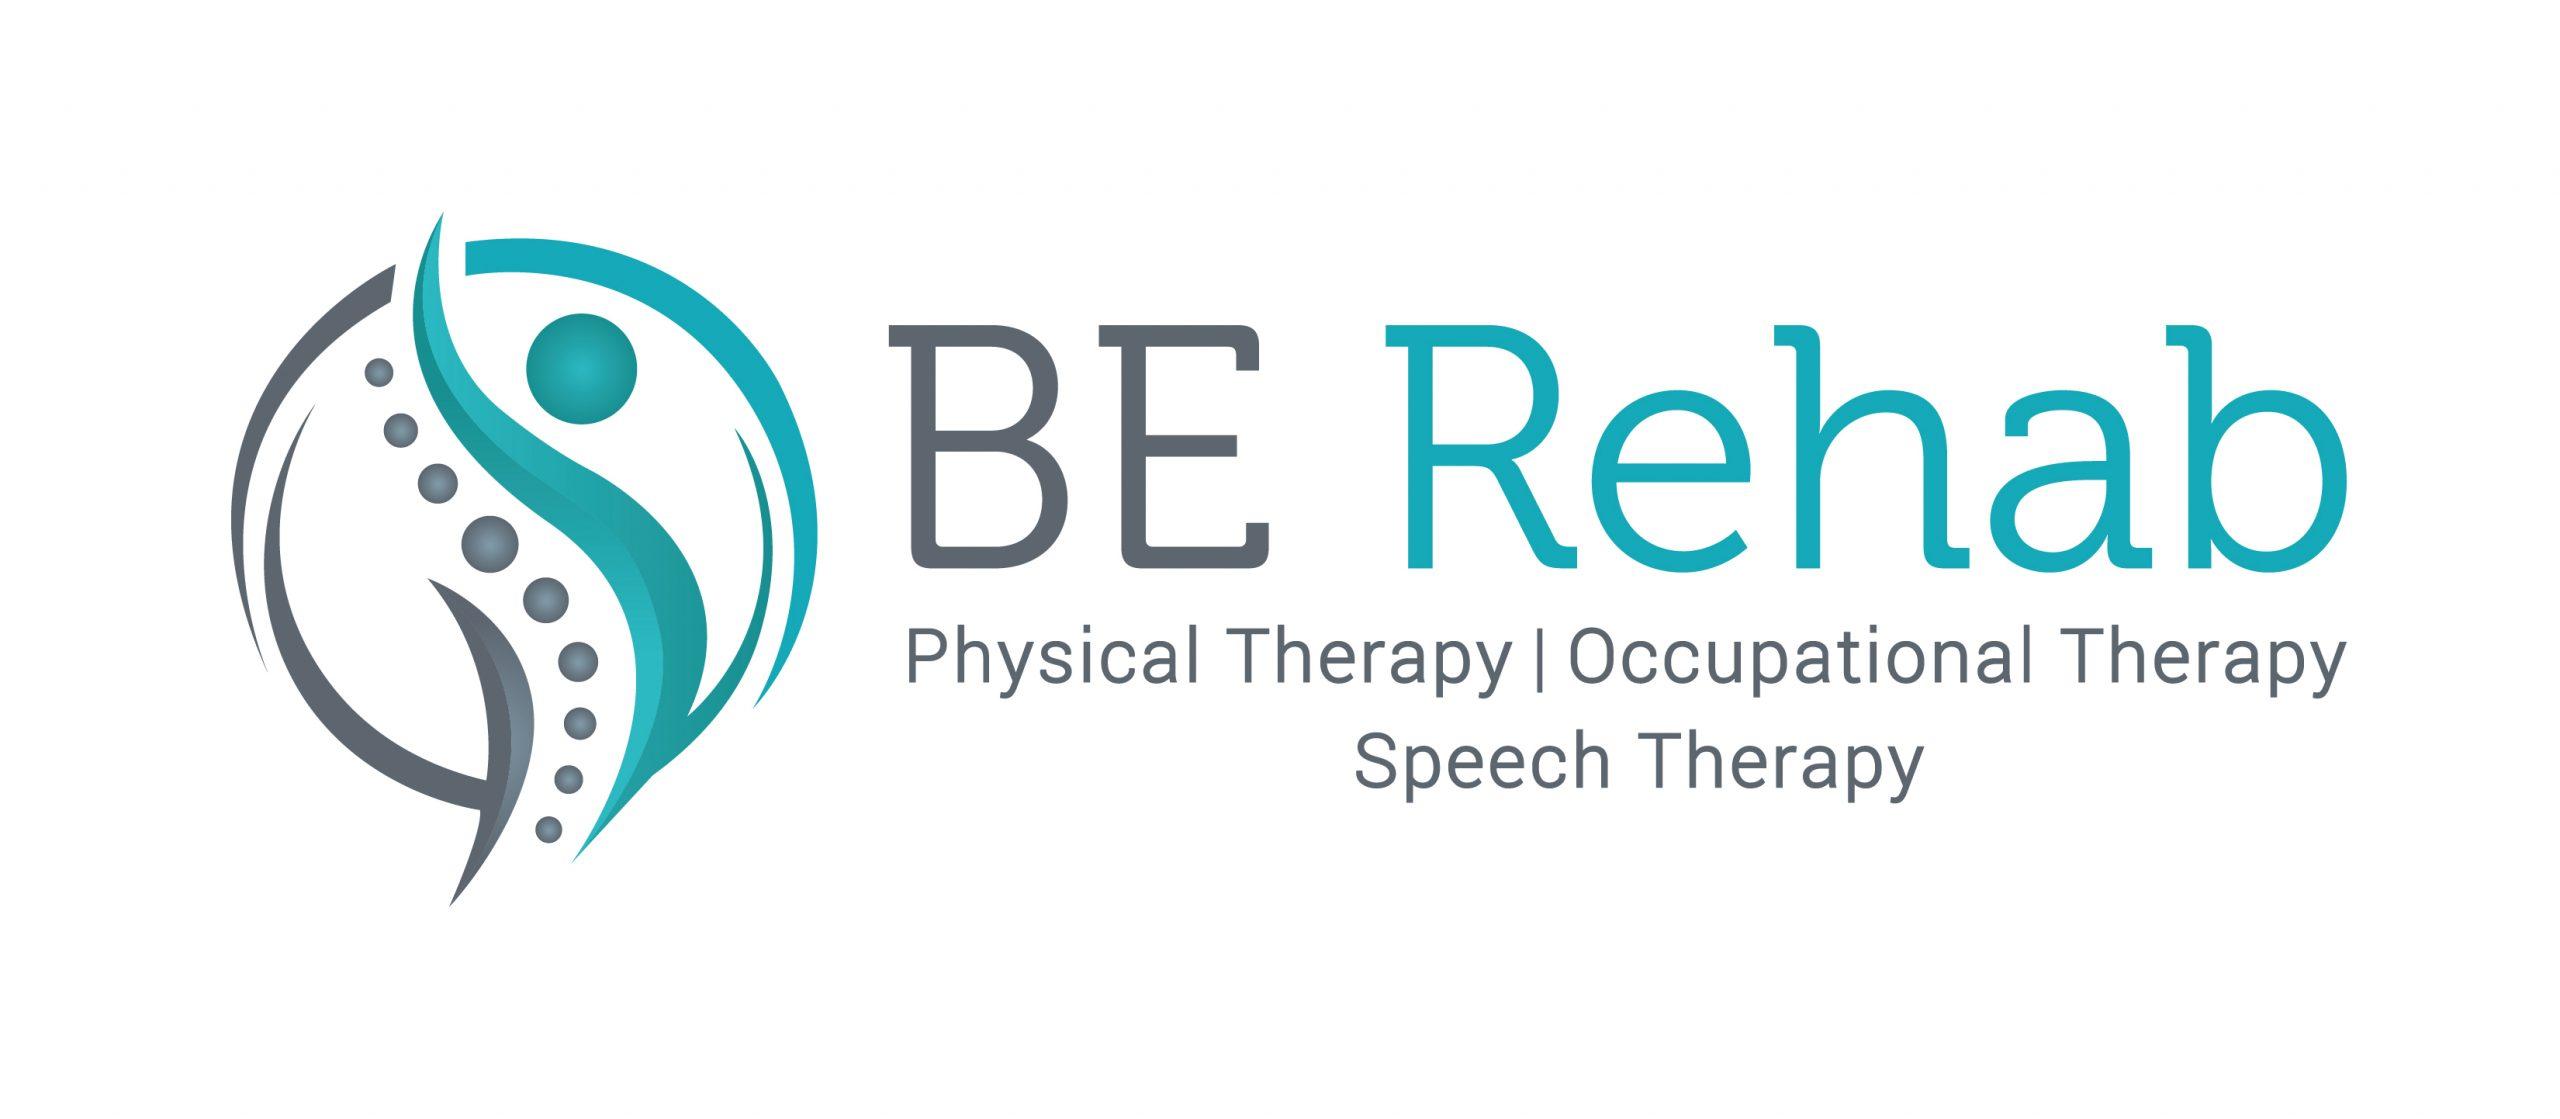 BE Rehab – Rehabilitation Services At Home